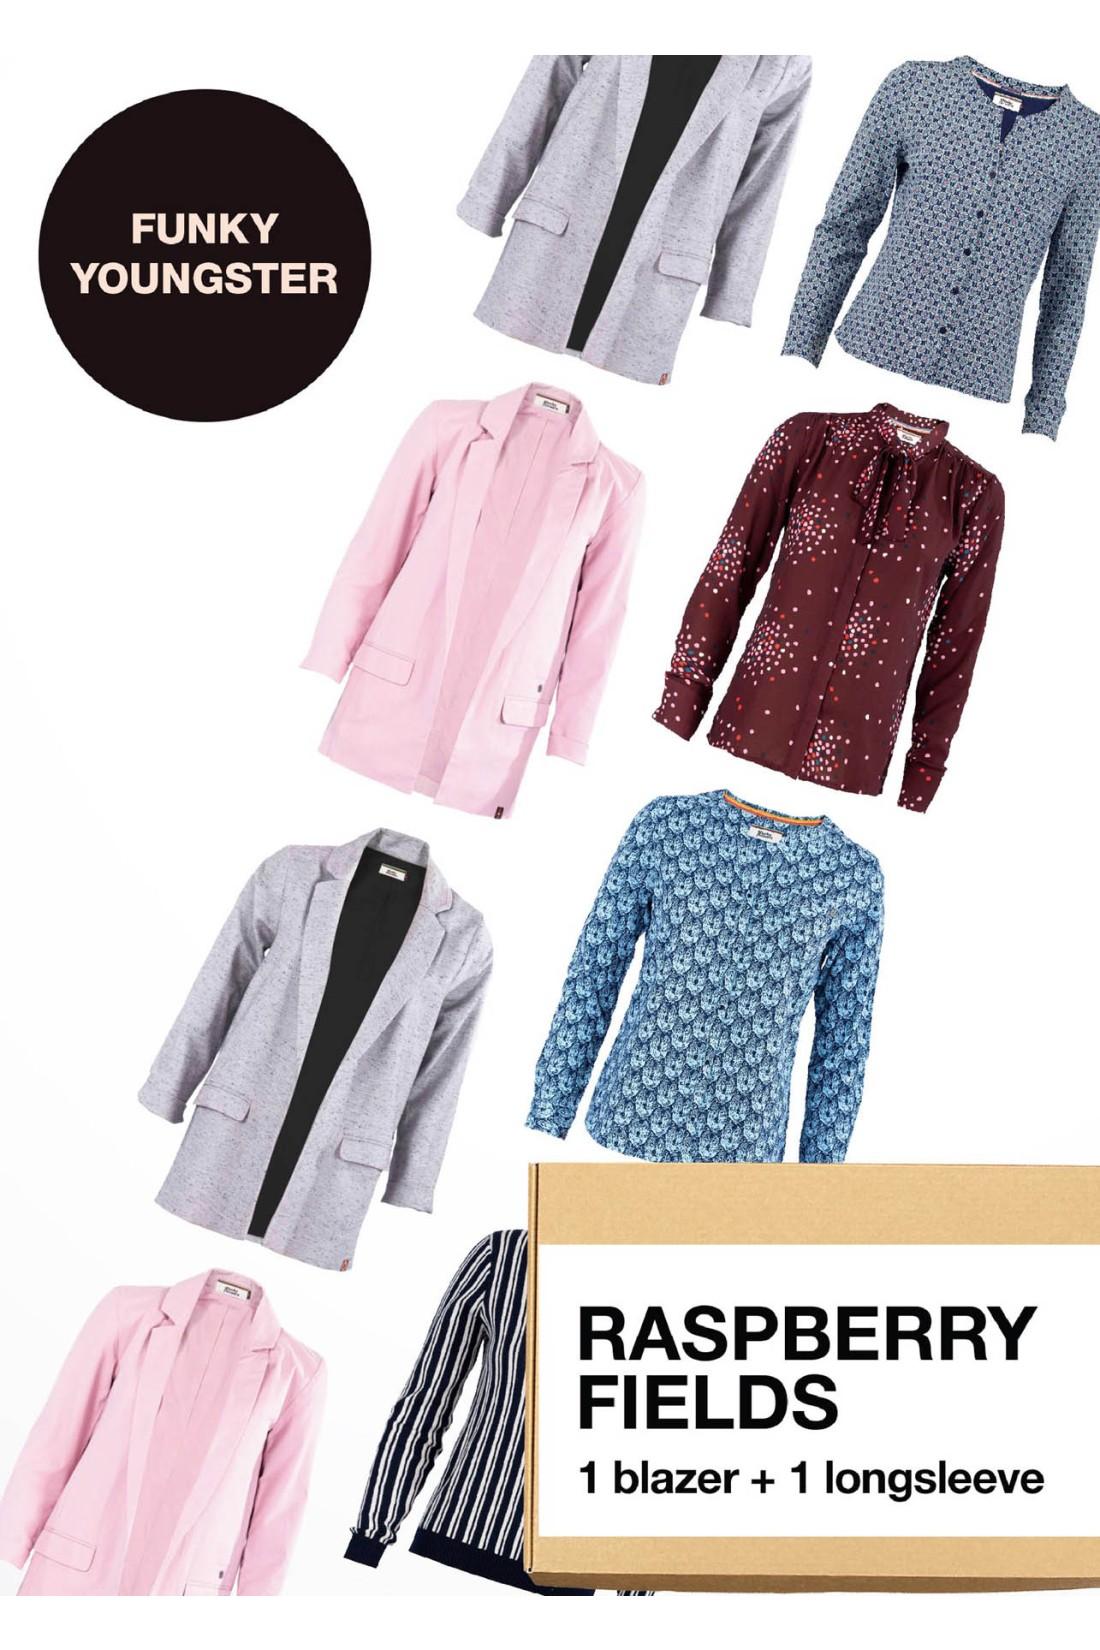 Surprise Box FUNKY YOUNGSTER - RASPBERRY FIELDS - 2 Styles XS-S - Blazer + Longsleeve